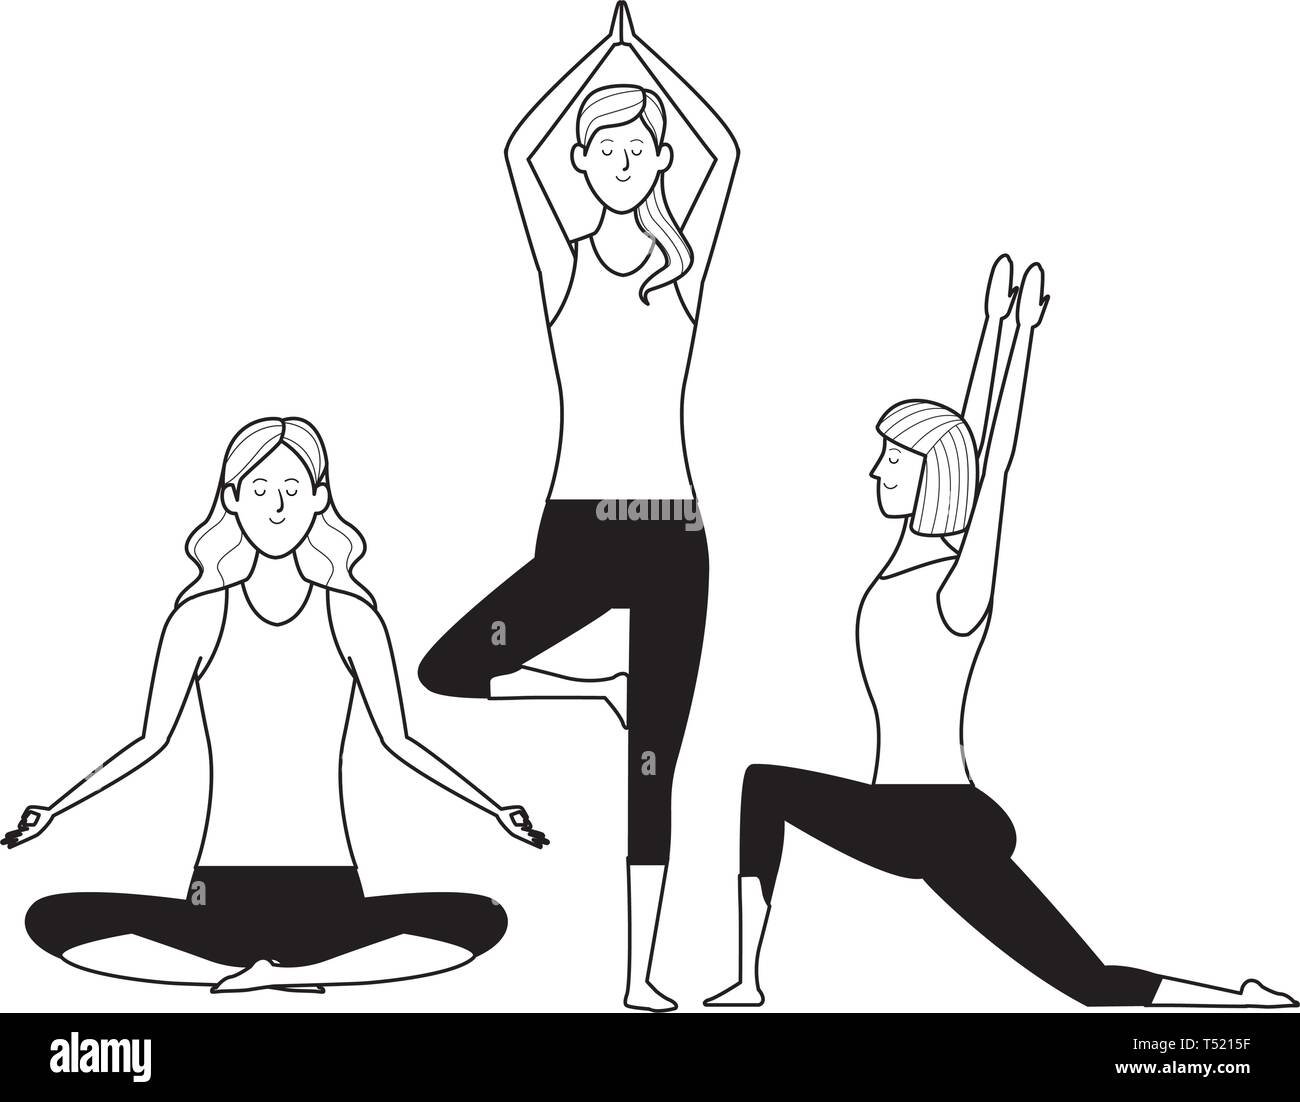 women yoga poses black and white Stock Vector Image & Art - Alamy